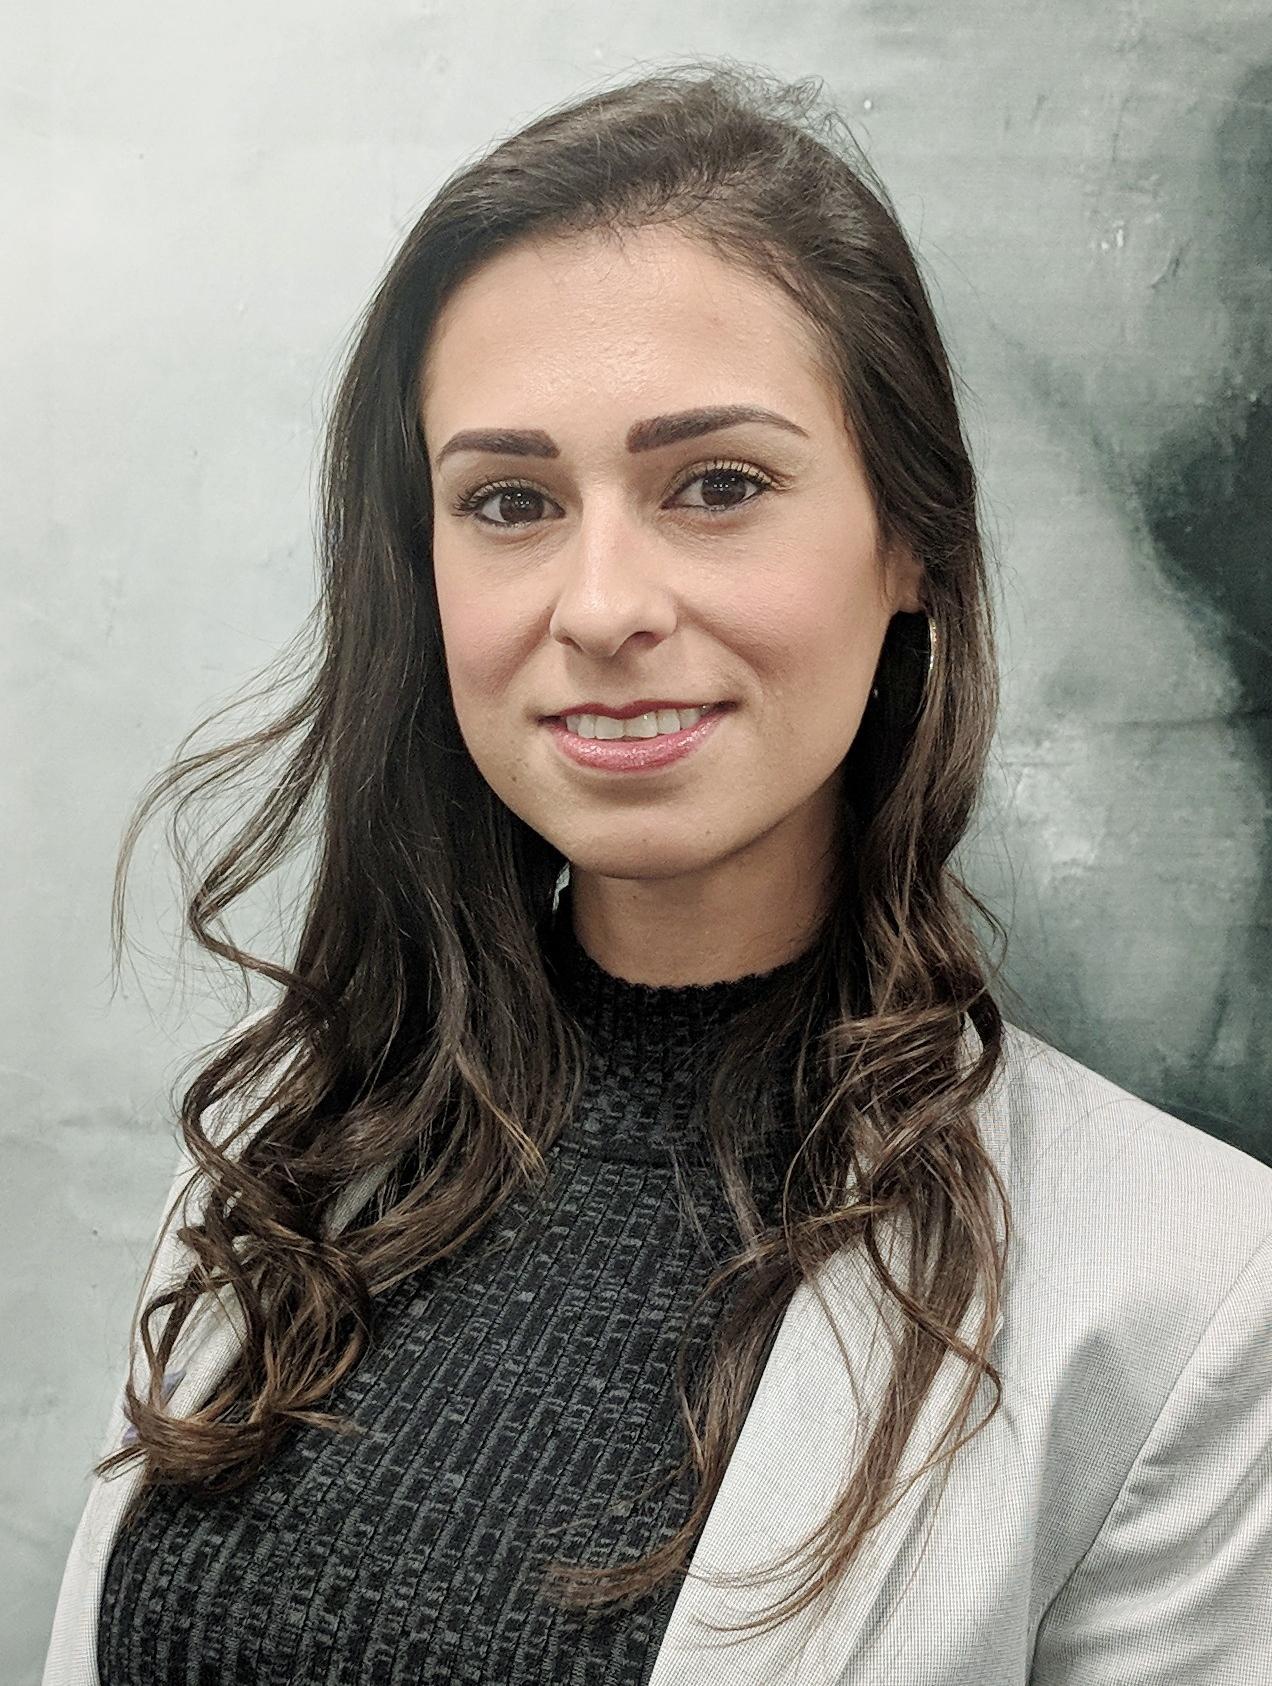 VANESSA OLIVEIRA HENDRICKSON  Insurance Agent